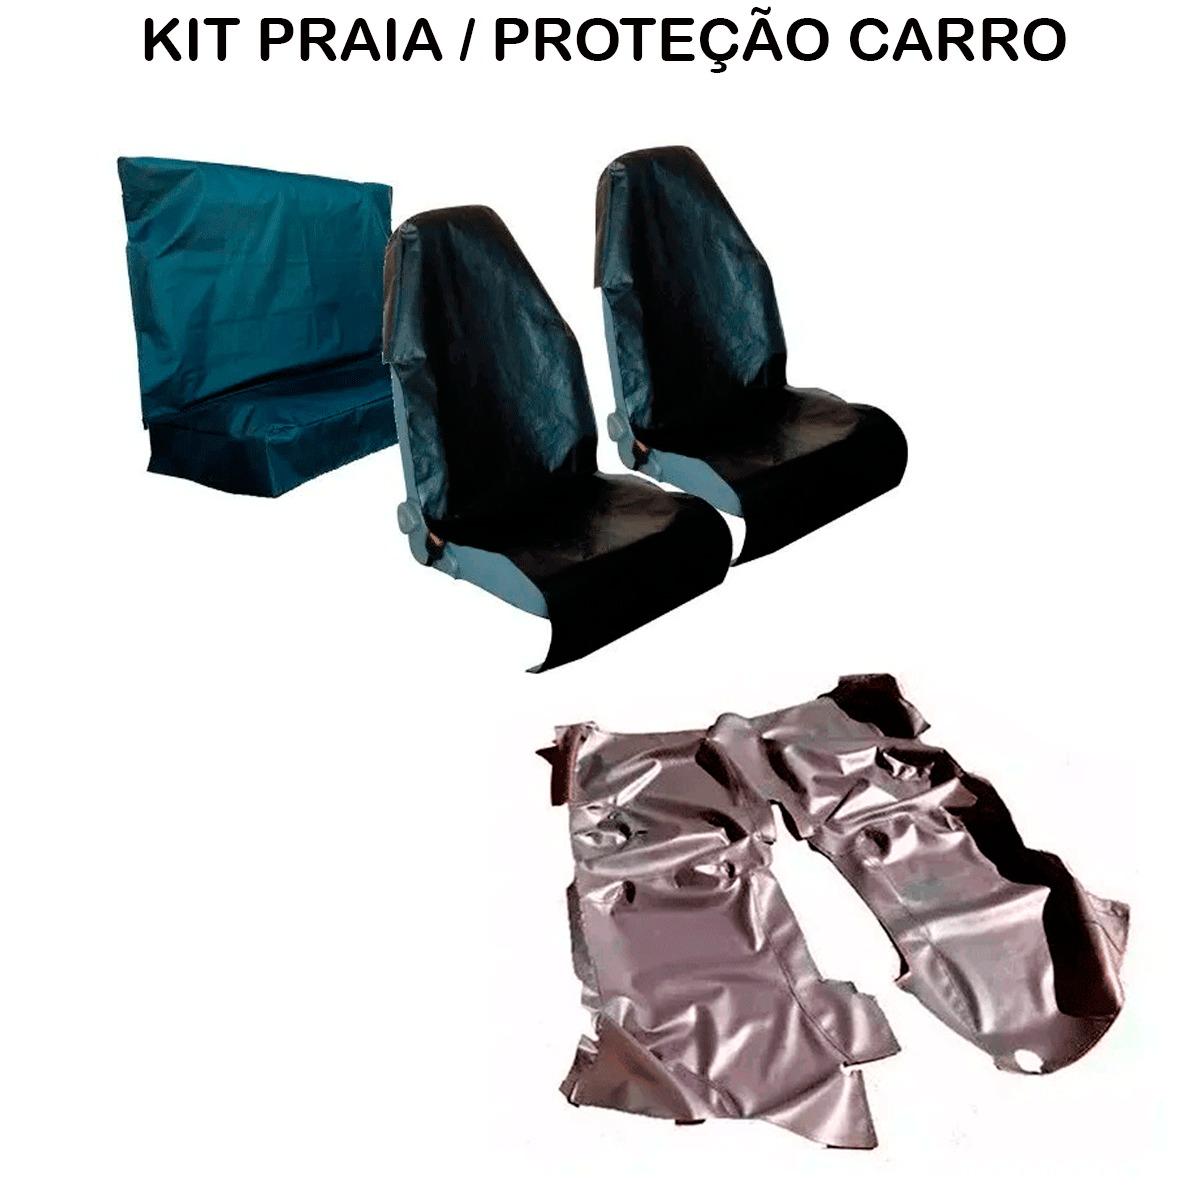 Tapete Em Vinil Fiat Panorama + Capa Banco Protecao Banco Areia Suor Academia